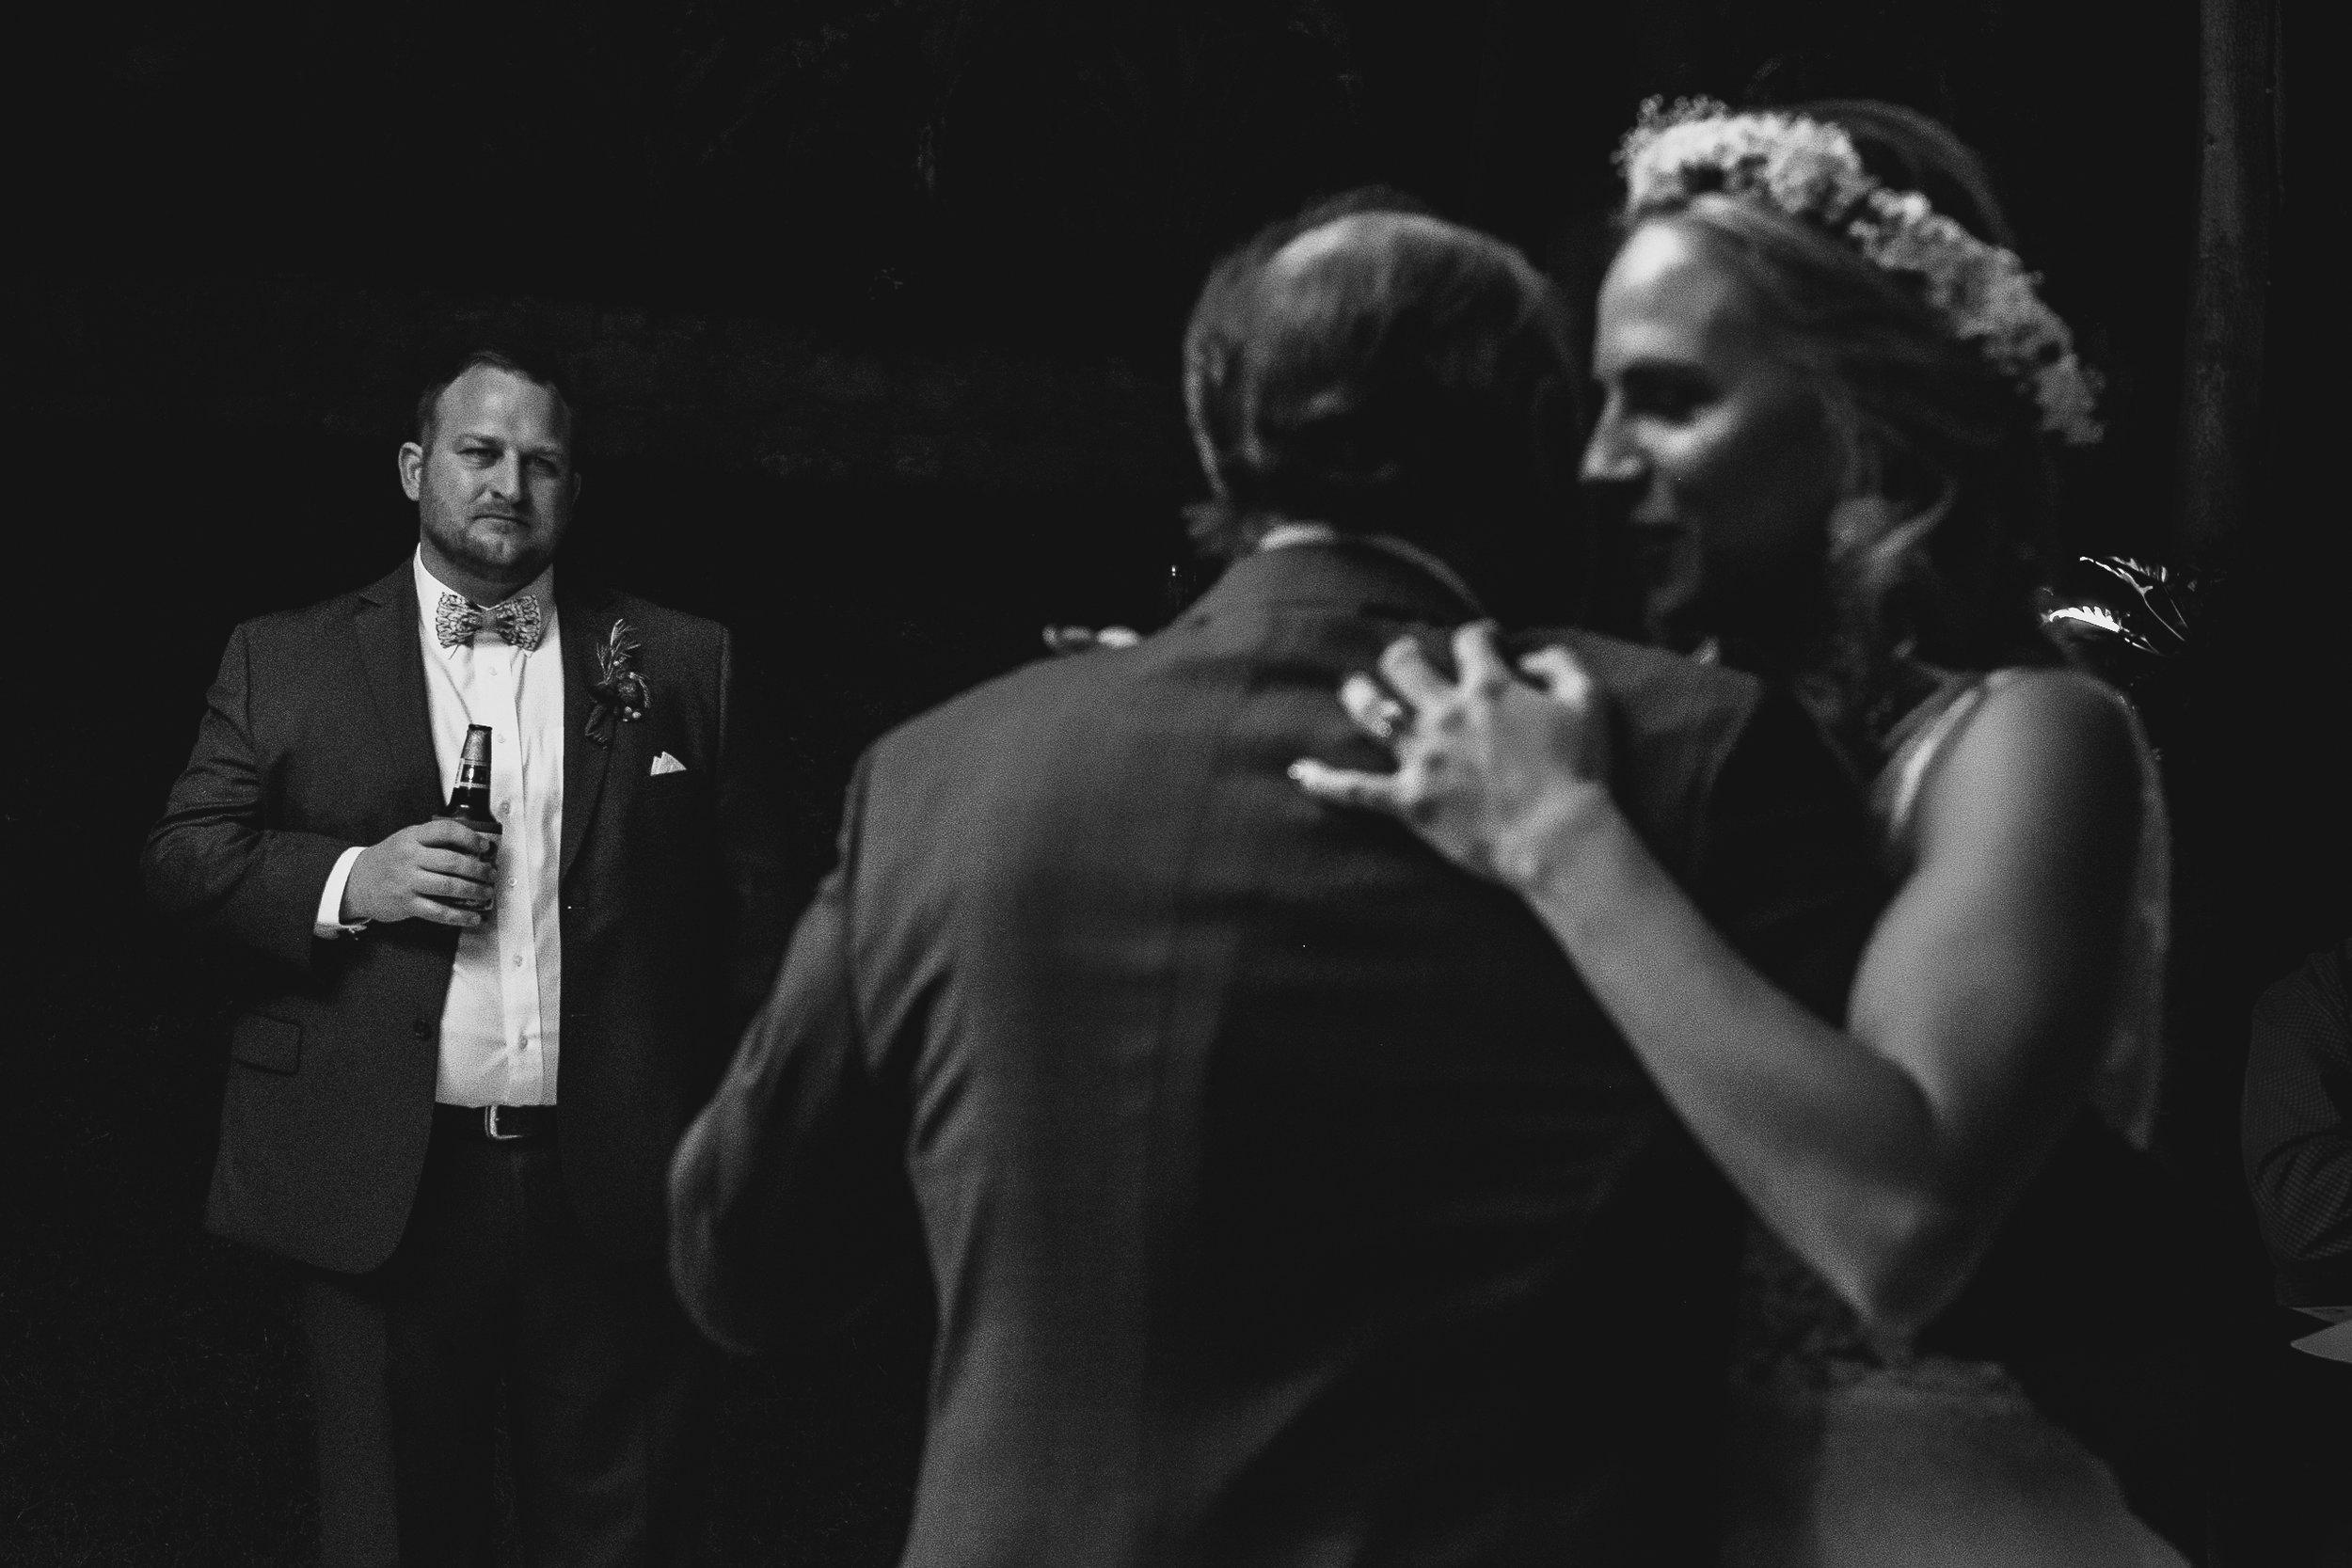 casa_chorro_wedding_san_miguel_de_allende_chio_garcia_photographer (8).jpg